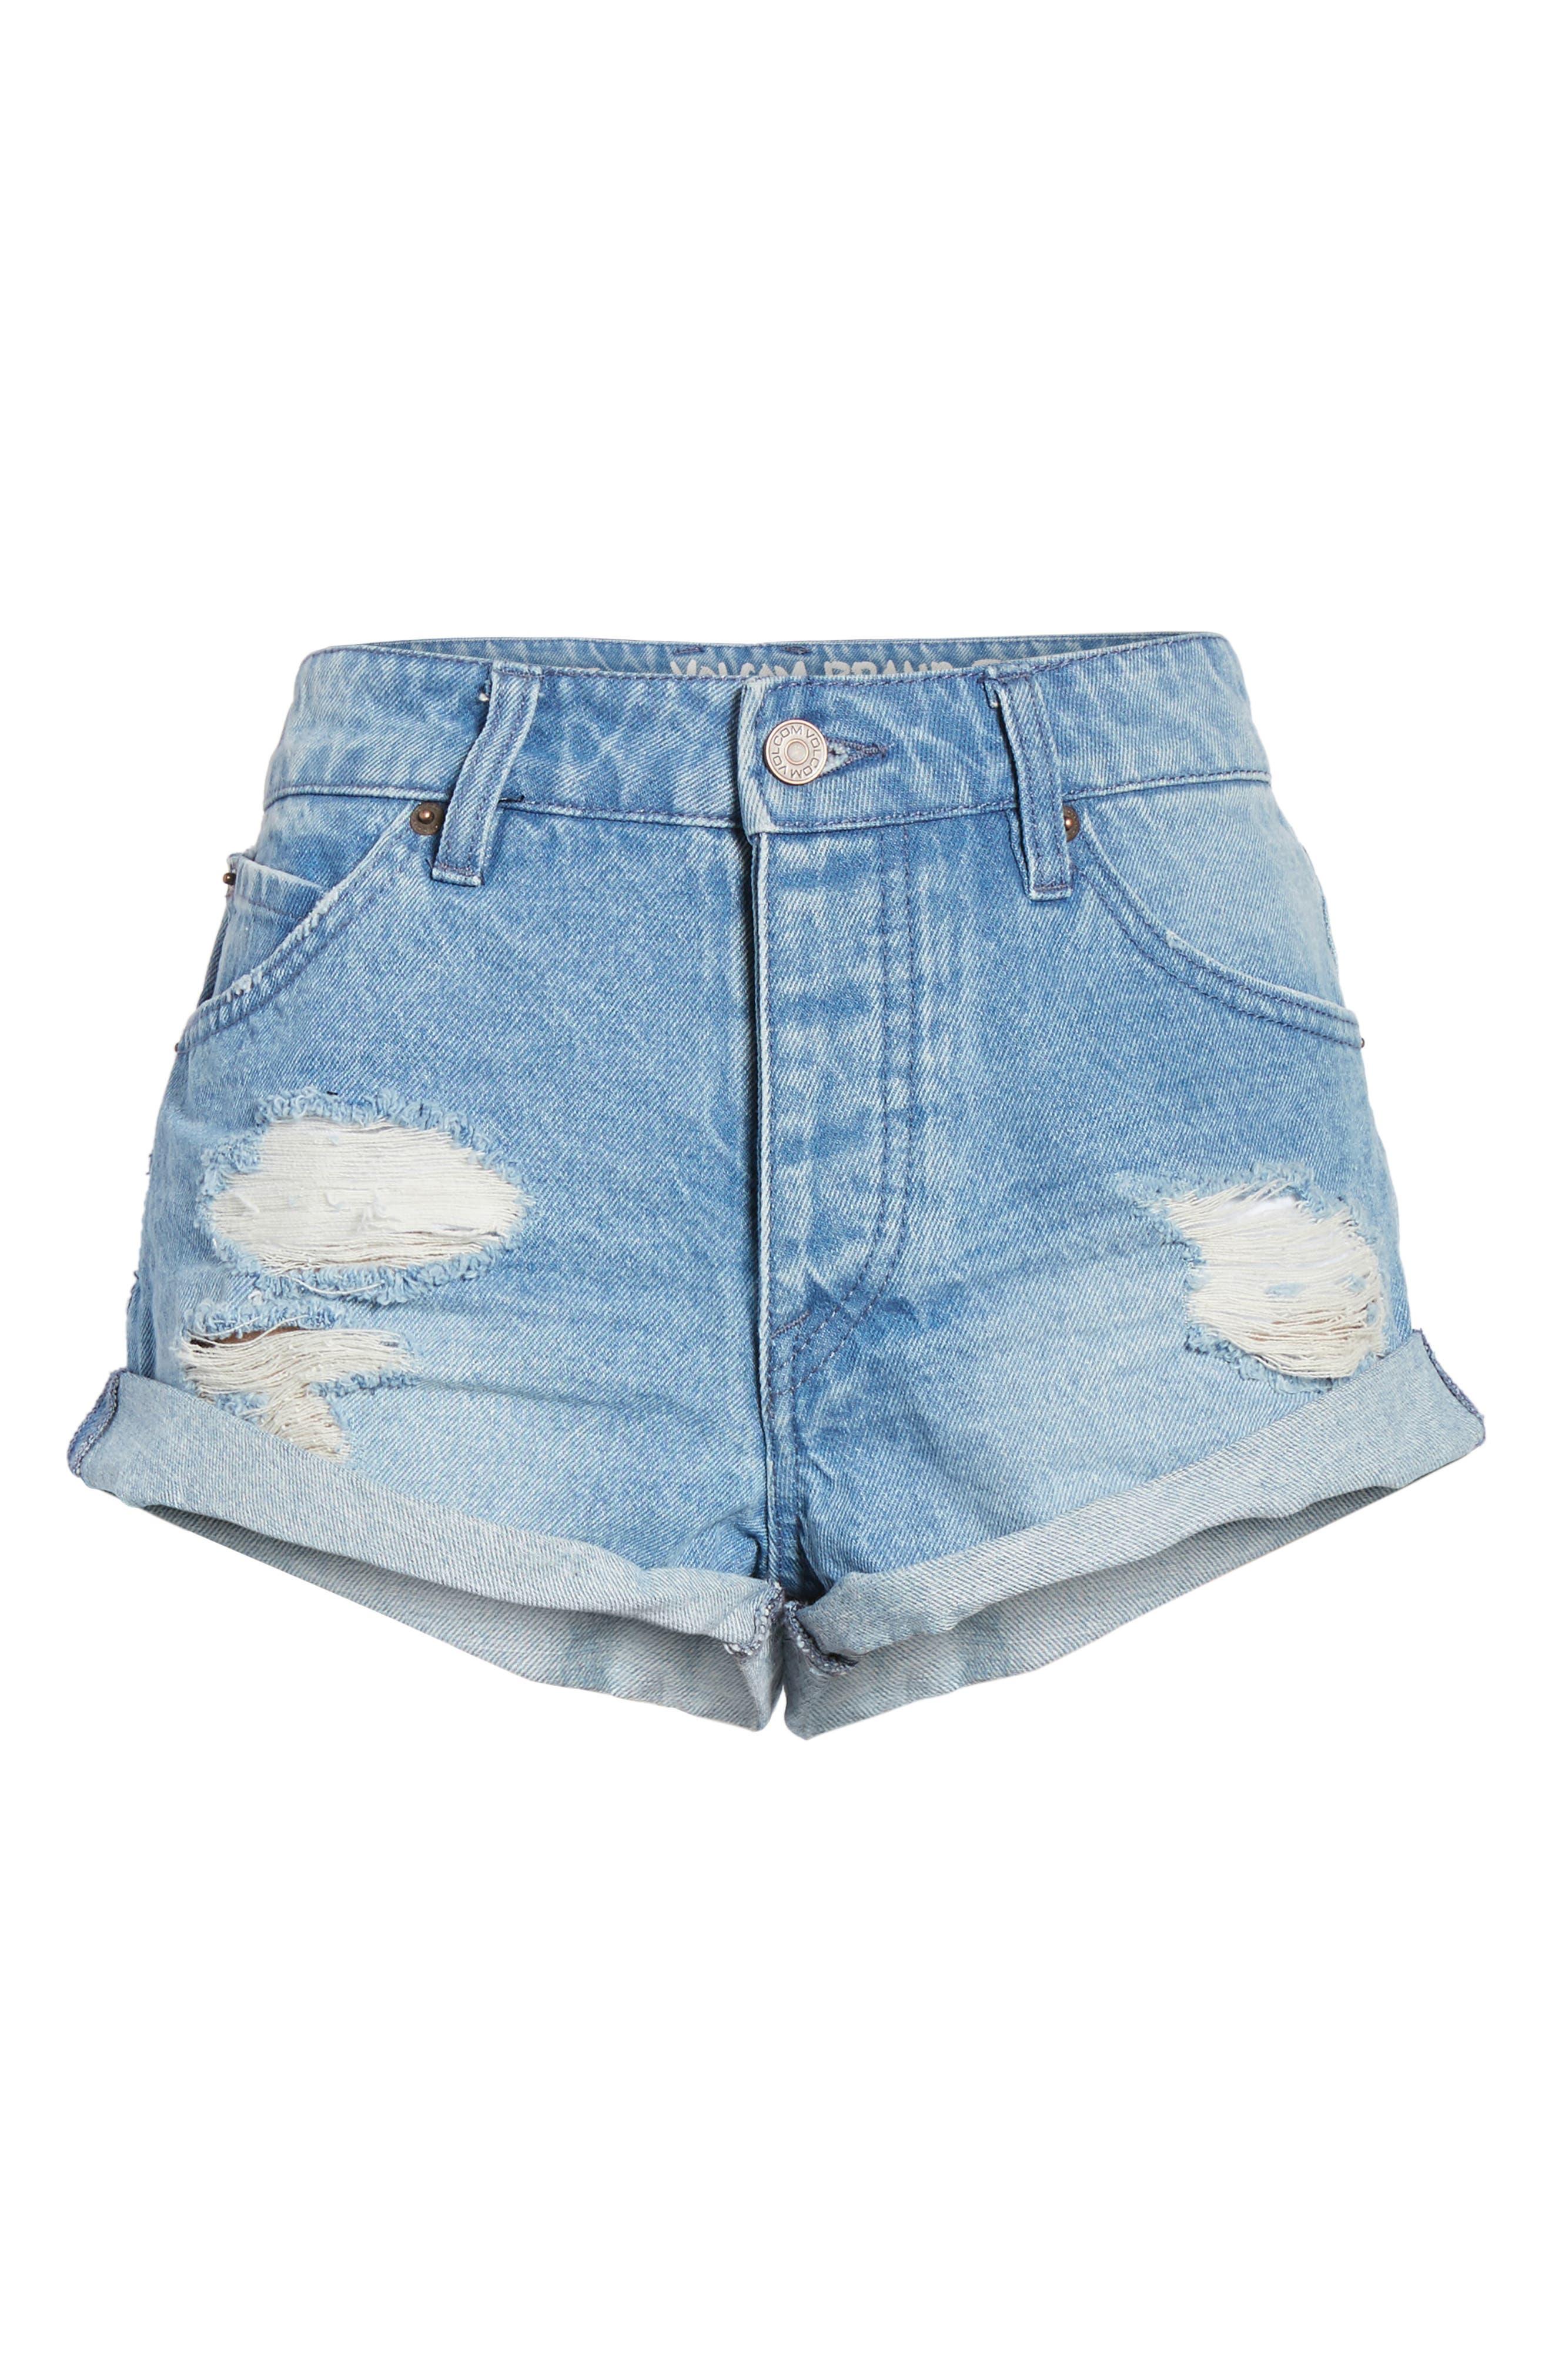 Rolled Denim Shorts,                             Alternate thumbnail 12, color,